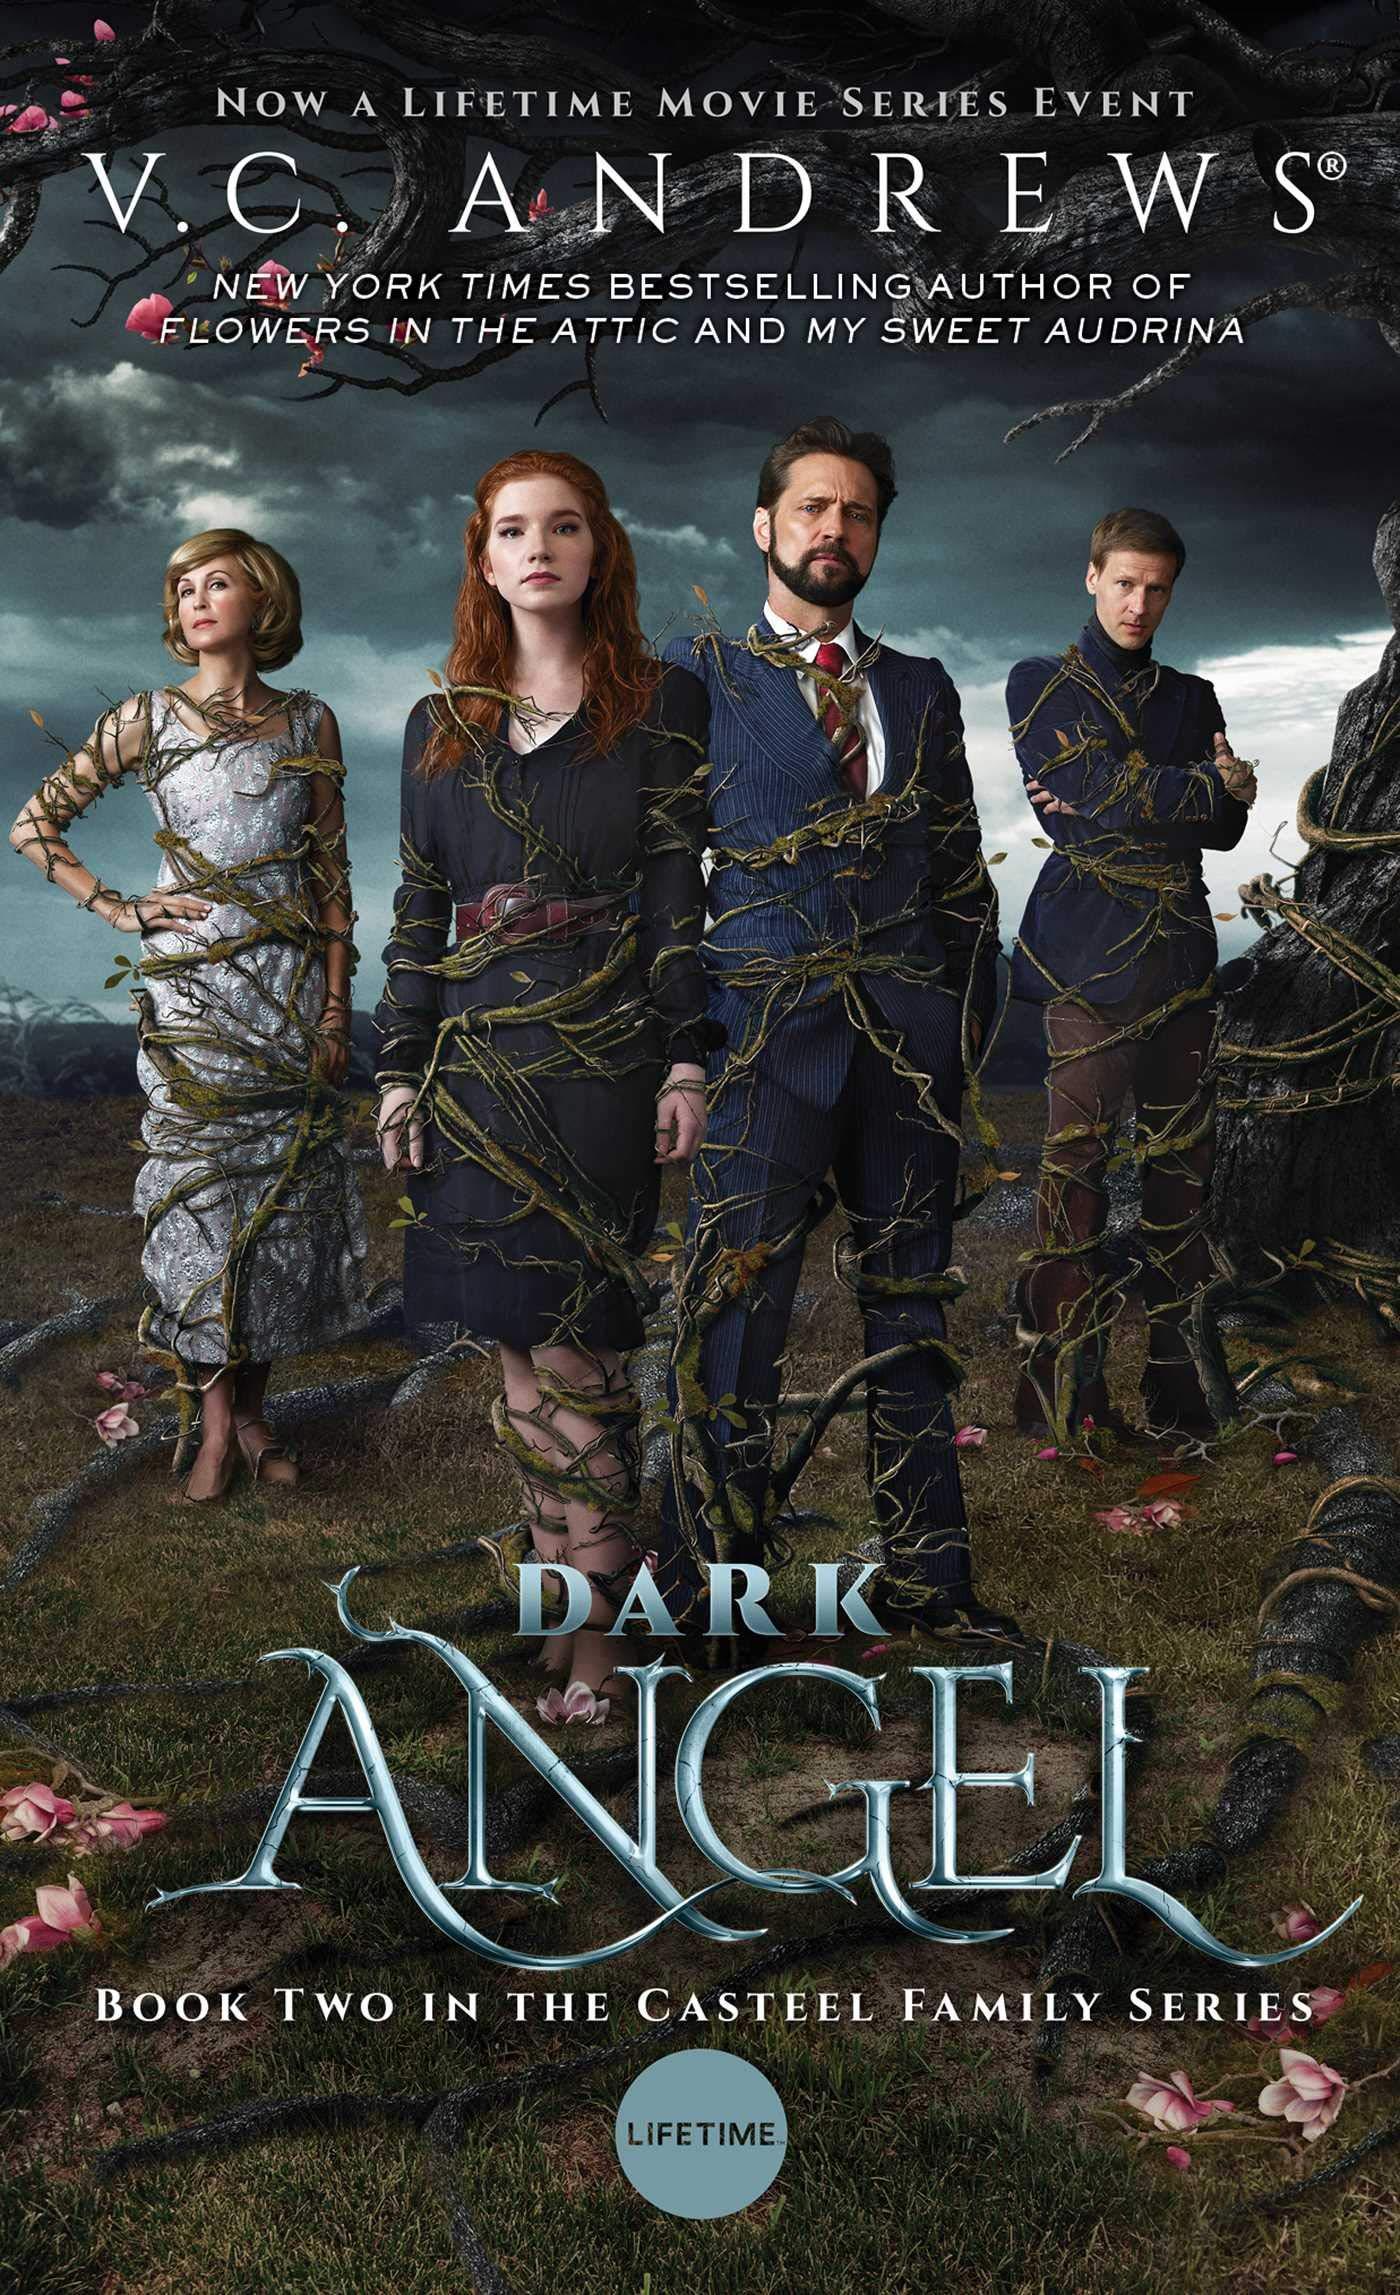 V.C. Andrews\u0027 Dark Angel (2019) starring Annalise Basso, Jason Priestley